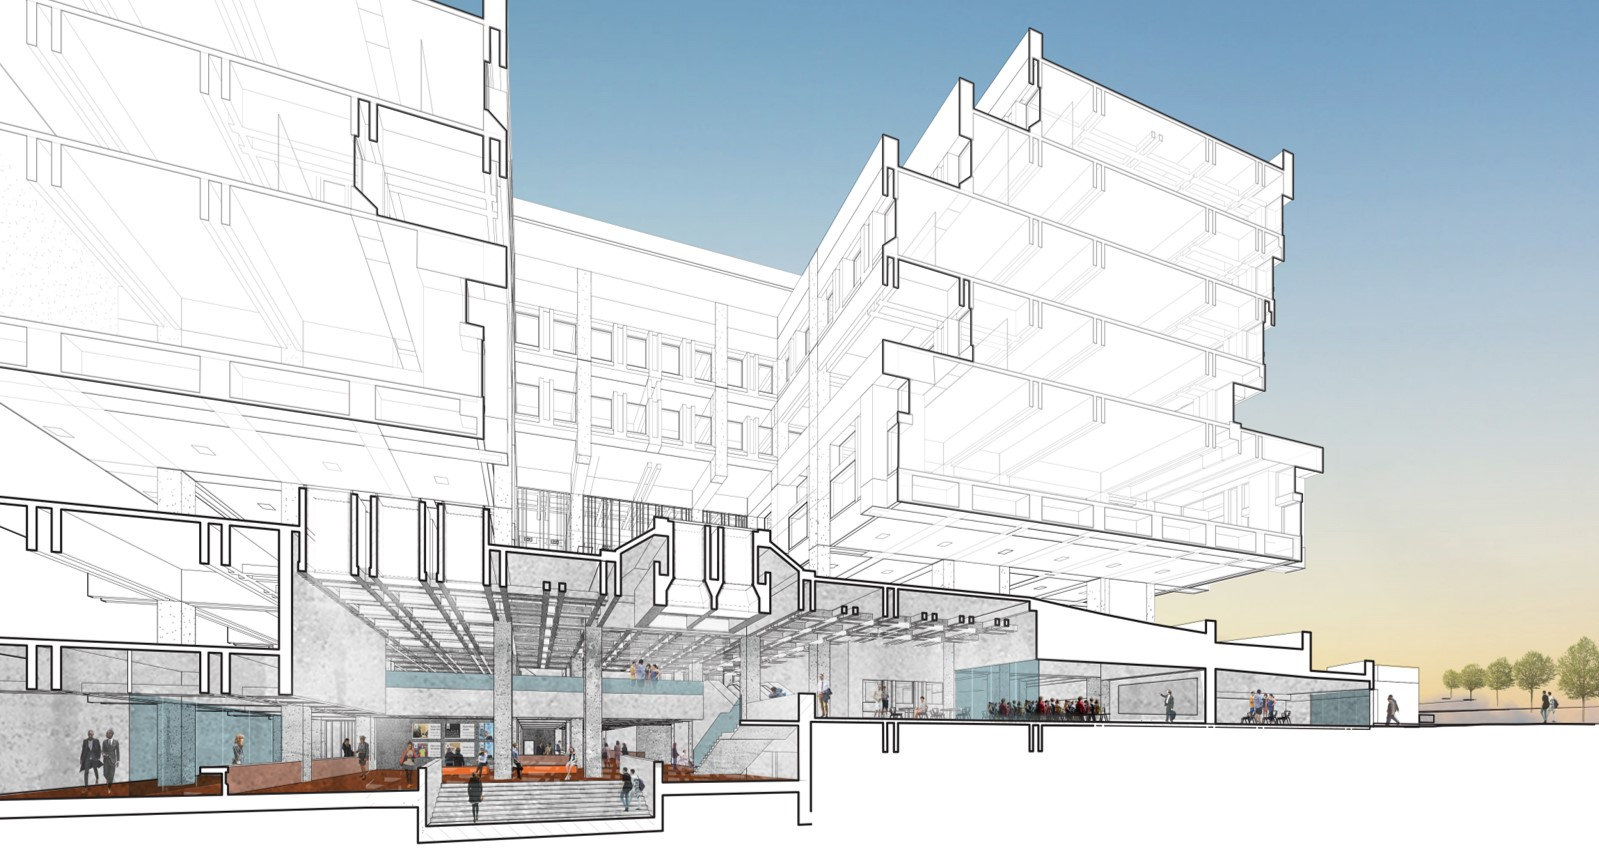 hall plan boston plaza master study architecture planning urban rethink section lobby renovation academic interiors utiledesign